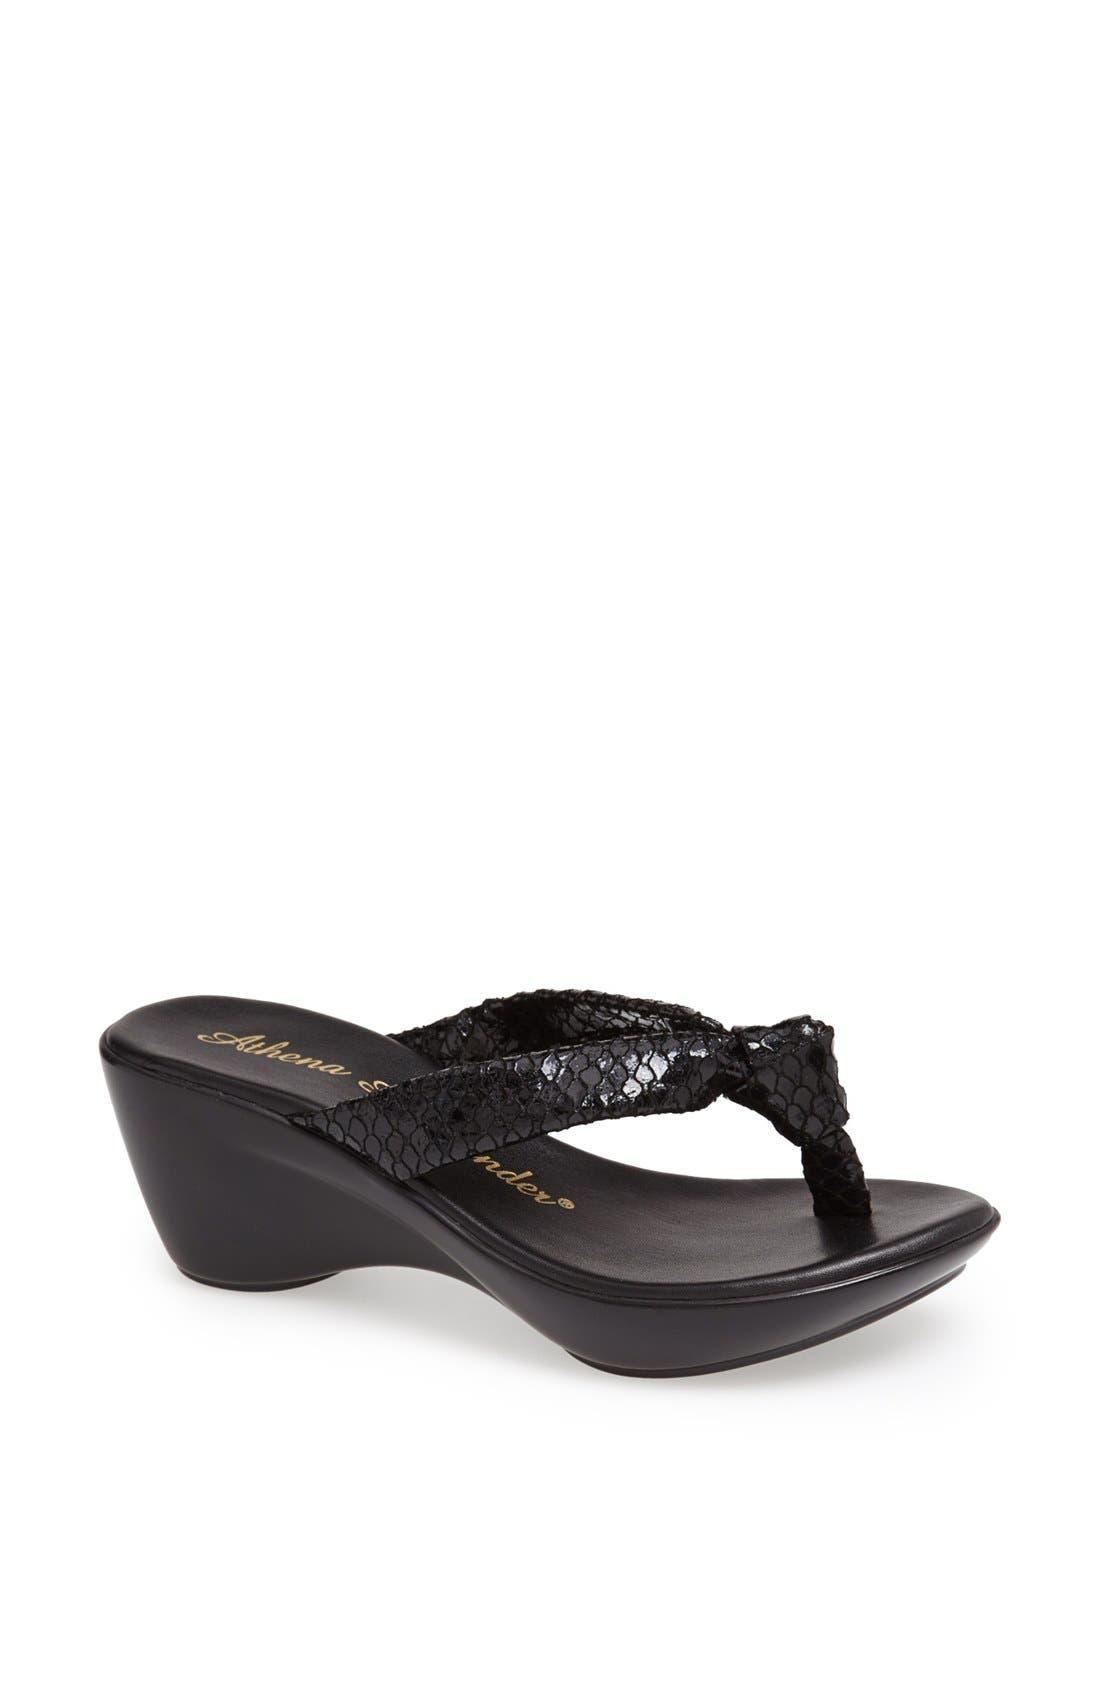 Alternate Image 1 Selected - Athena Alexander 'Ever' Wedge Sandal